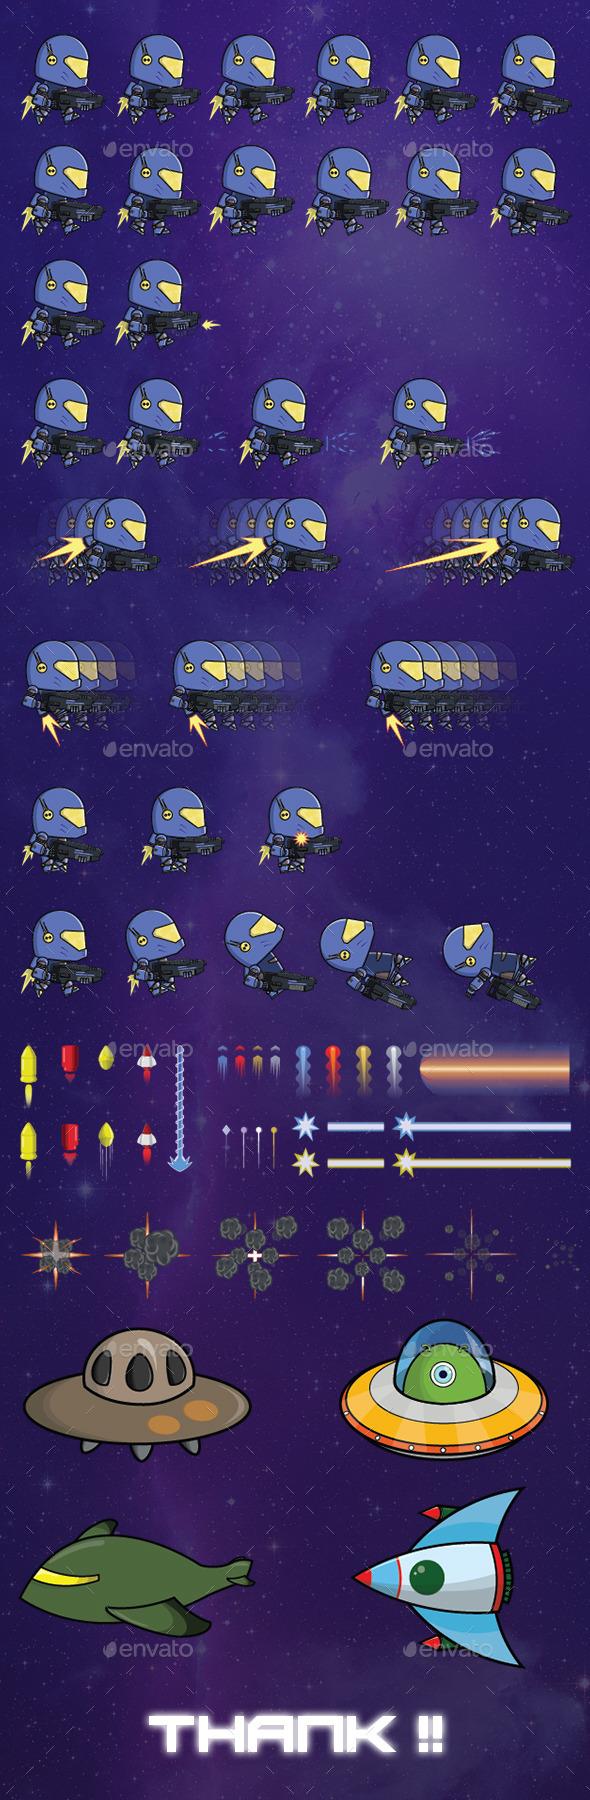 Game Galaxy Sprite - Mana - Sprites Game Assets